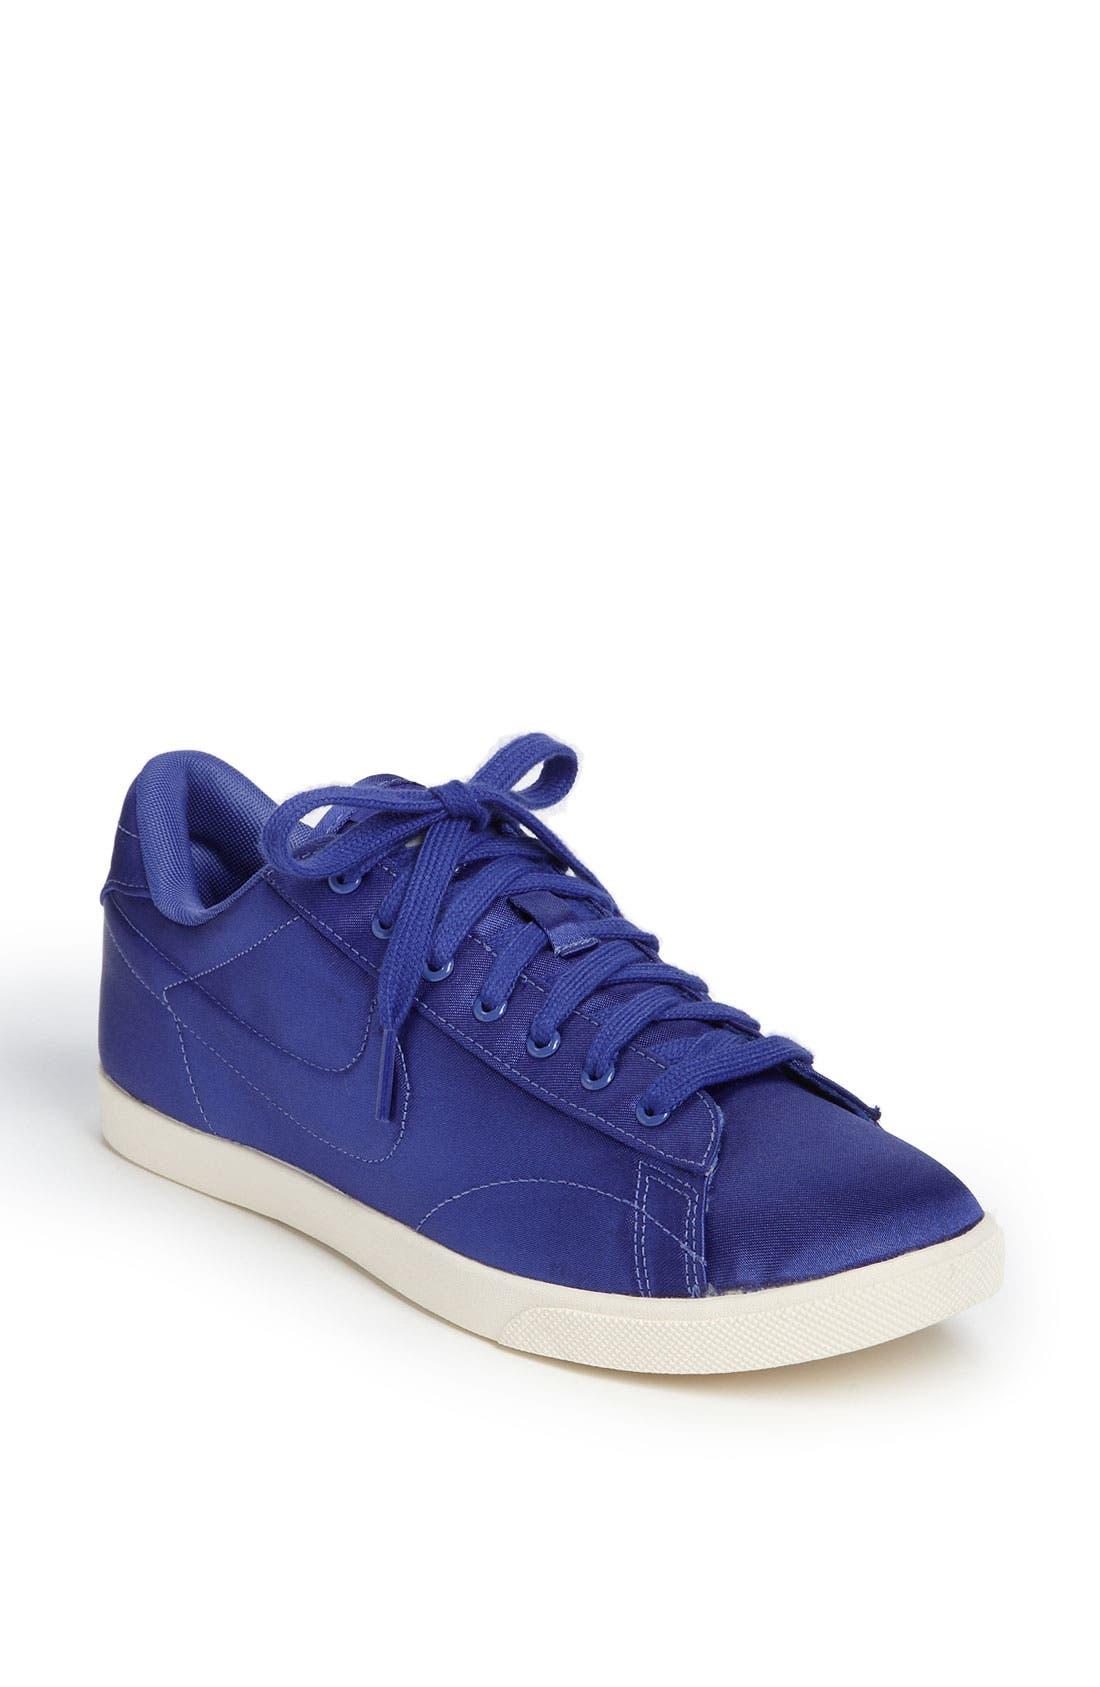 Alternate Image 1 Selected - Nike 'Racquette' Sneaker (Women)